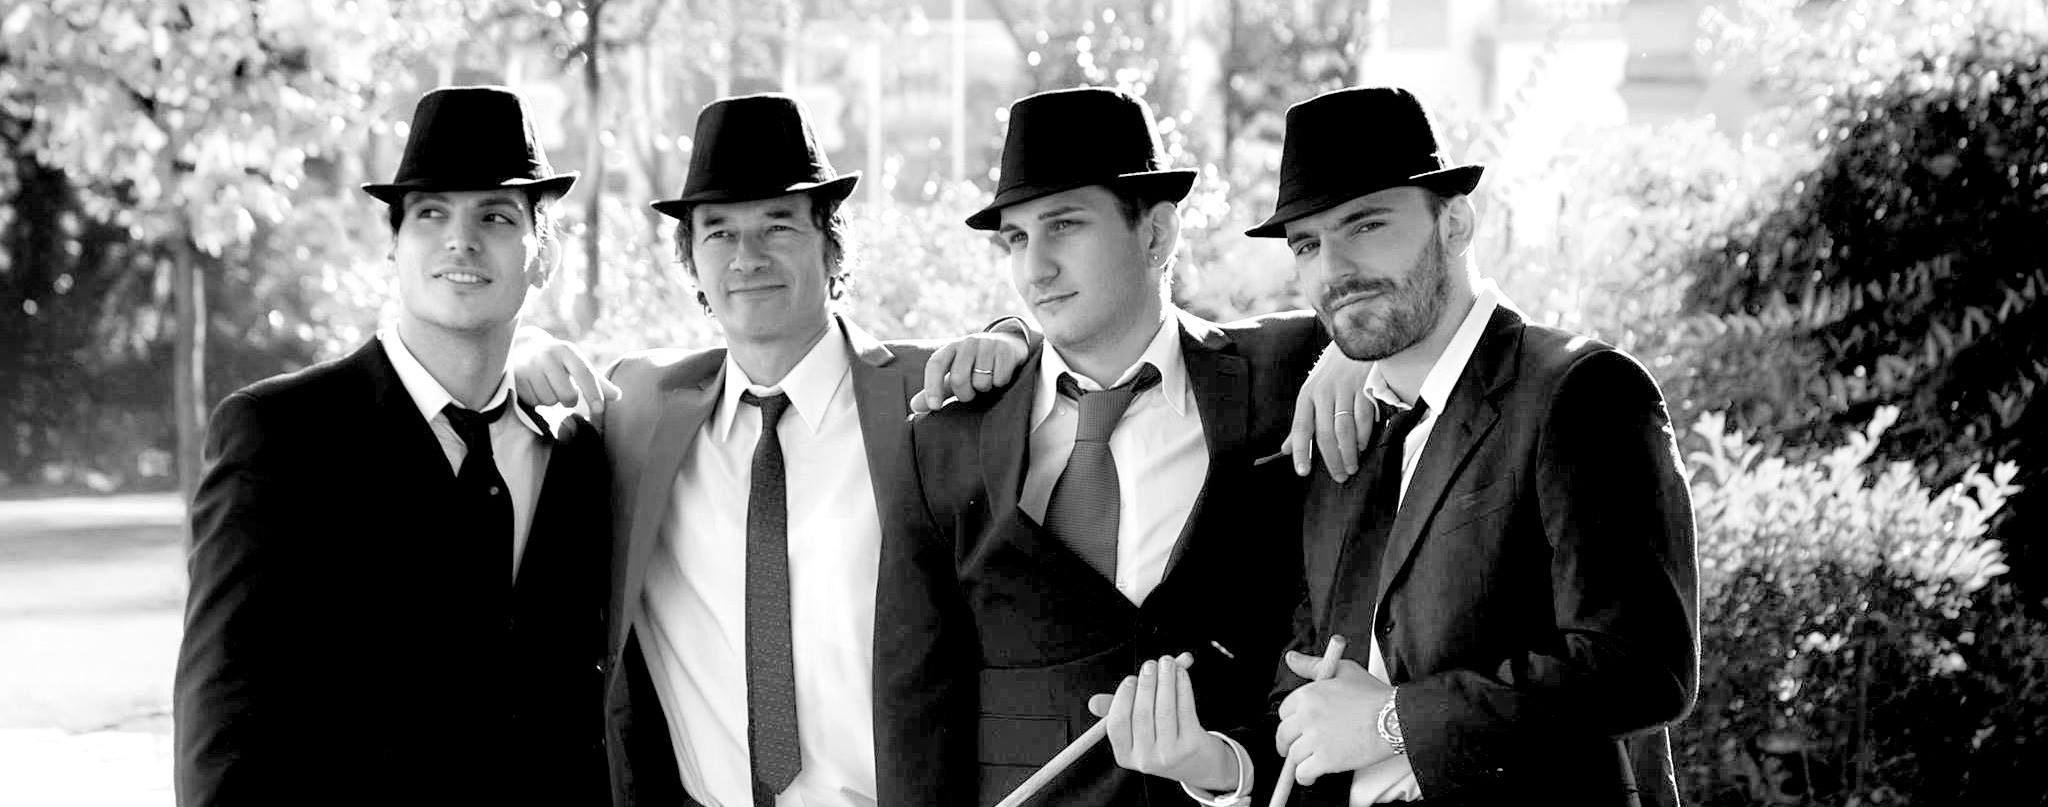 Swing-Band-Lazio-1.jpg